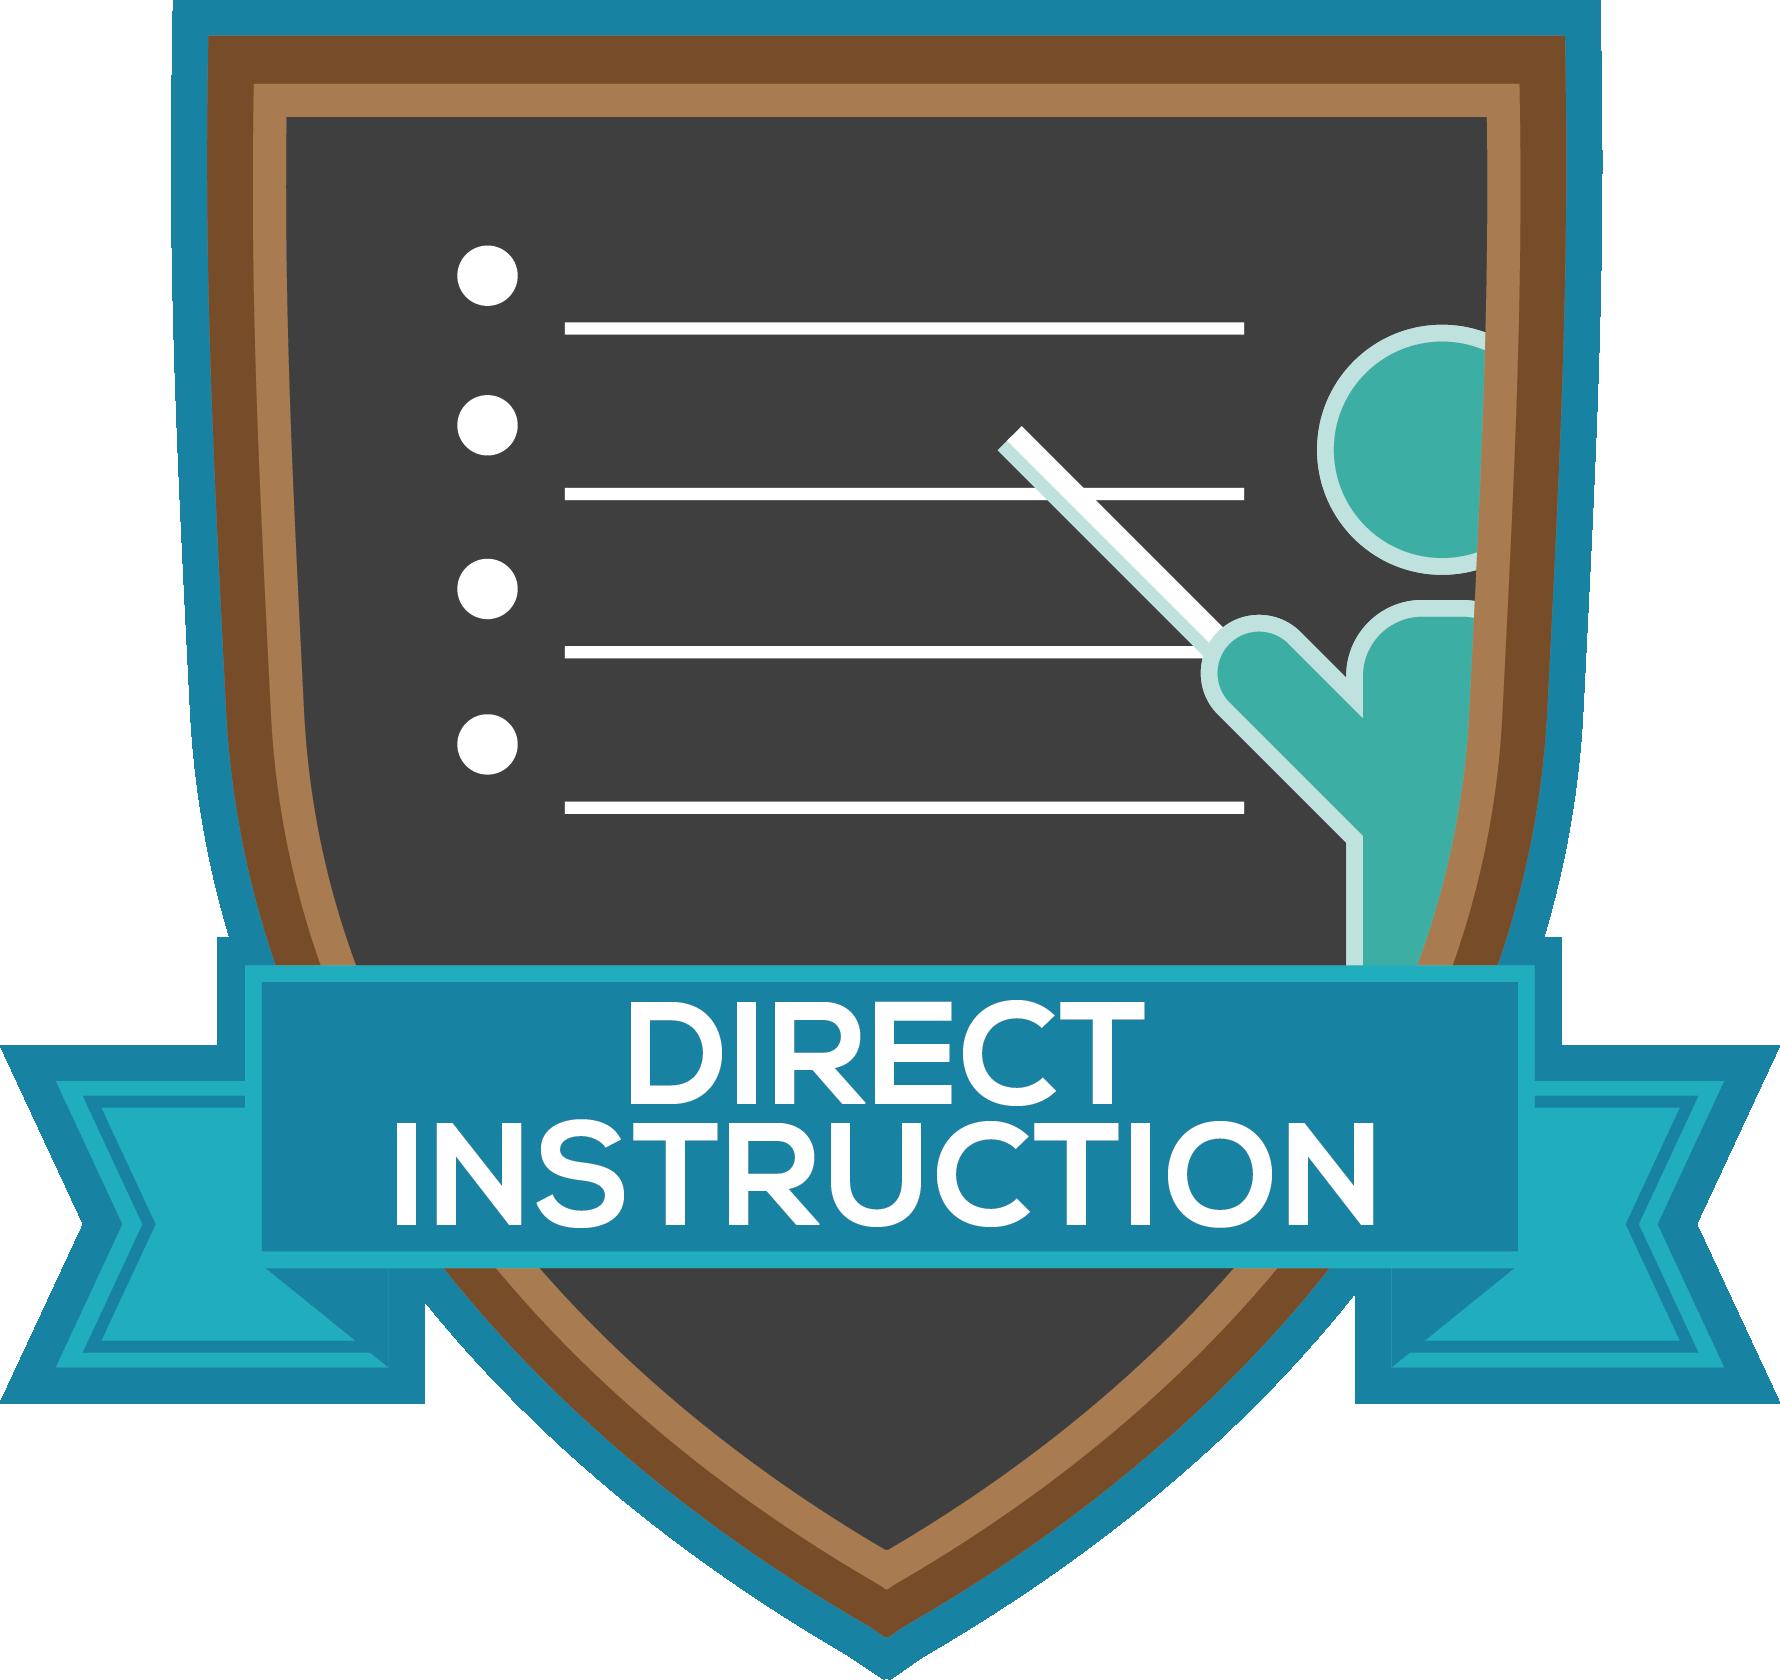 DirectInstruction_Badge_Finalized.png